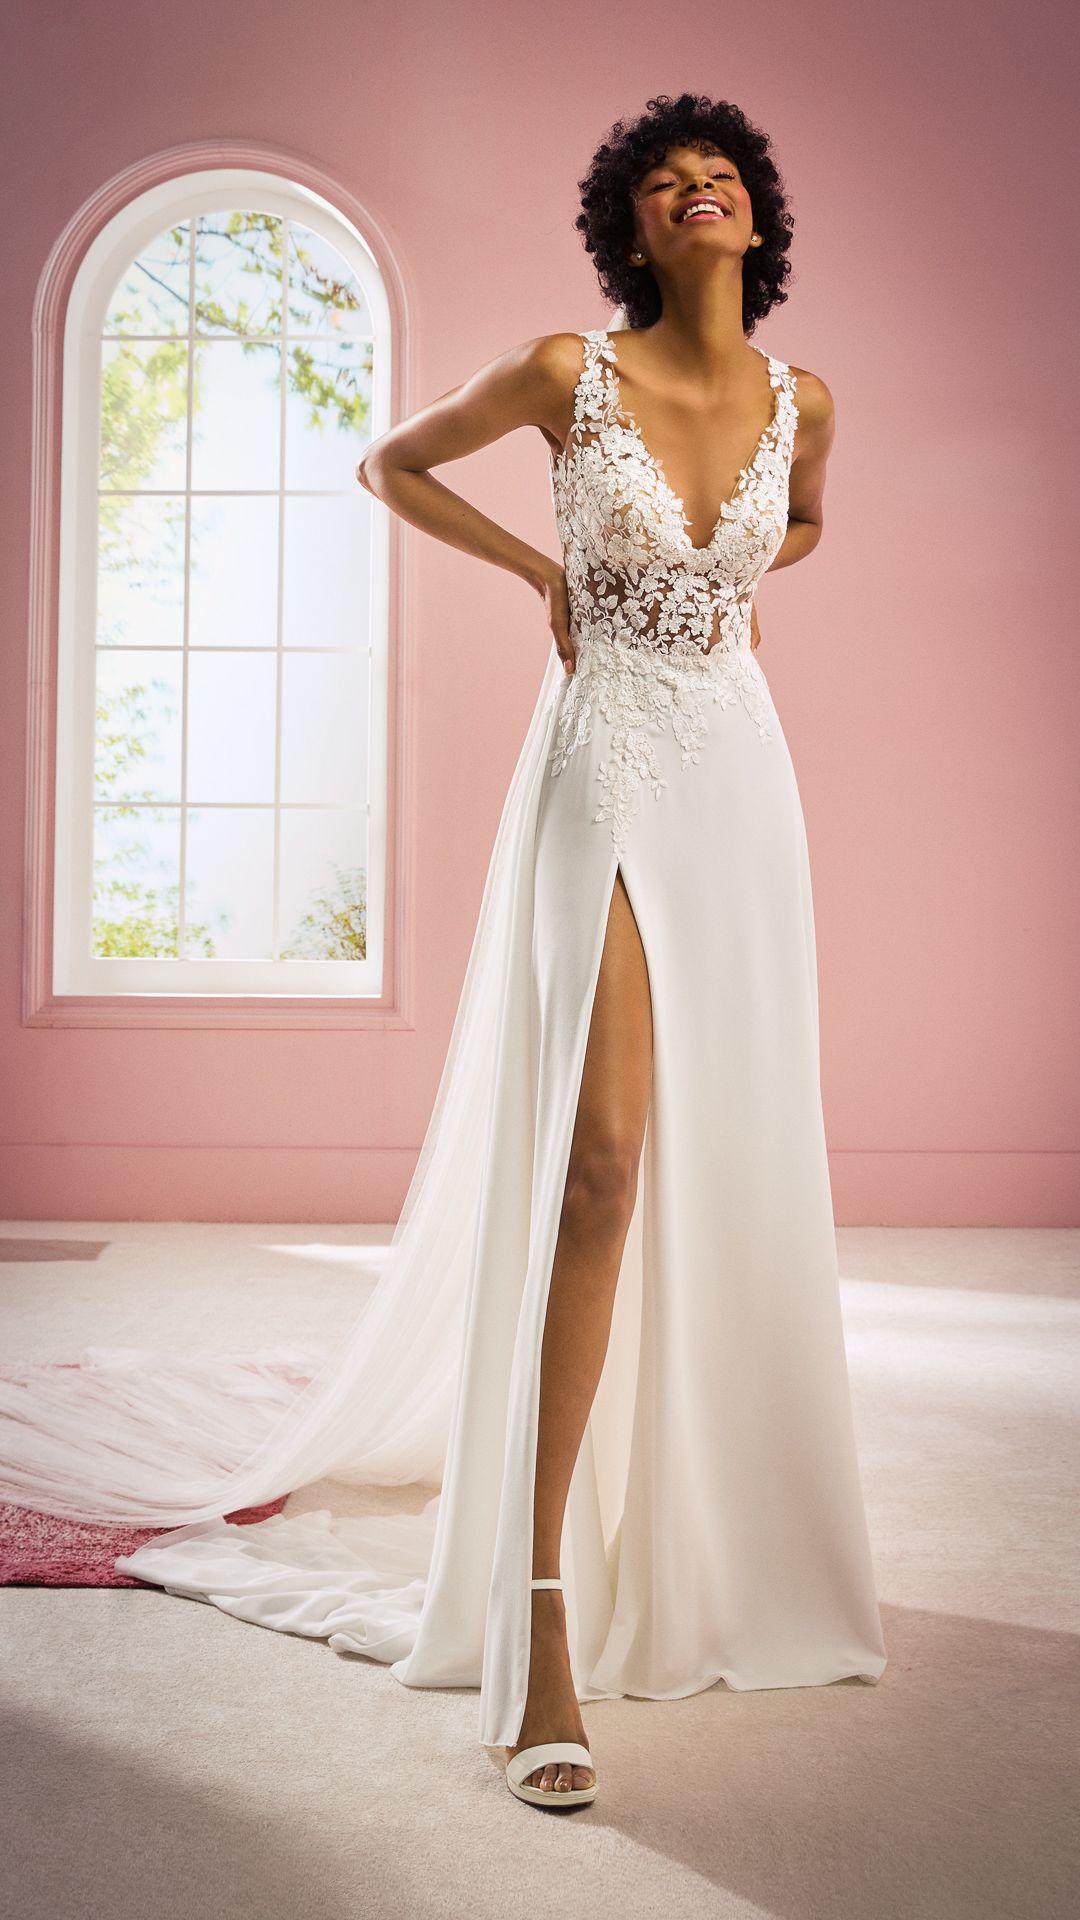 Hochzeitskleider 11 White One Kollektion Modell: AMA-B